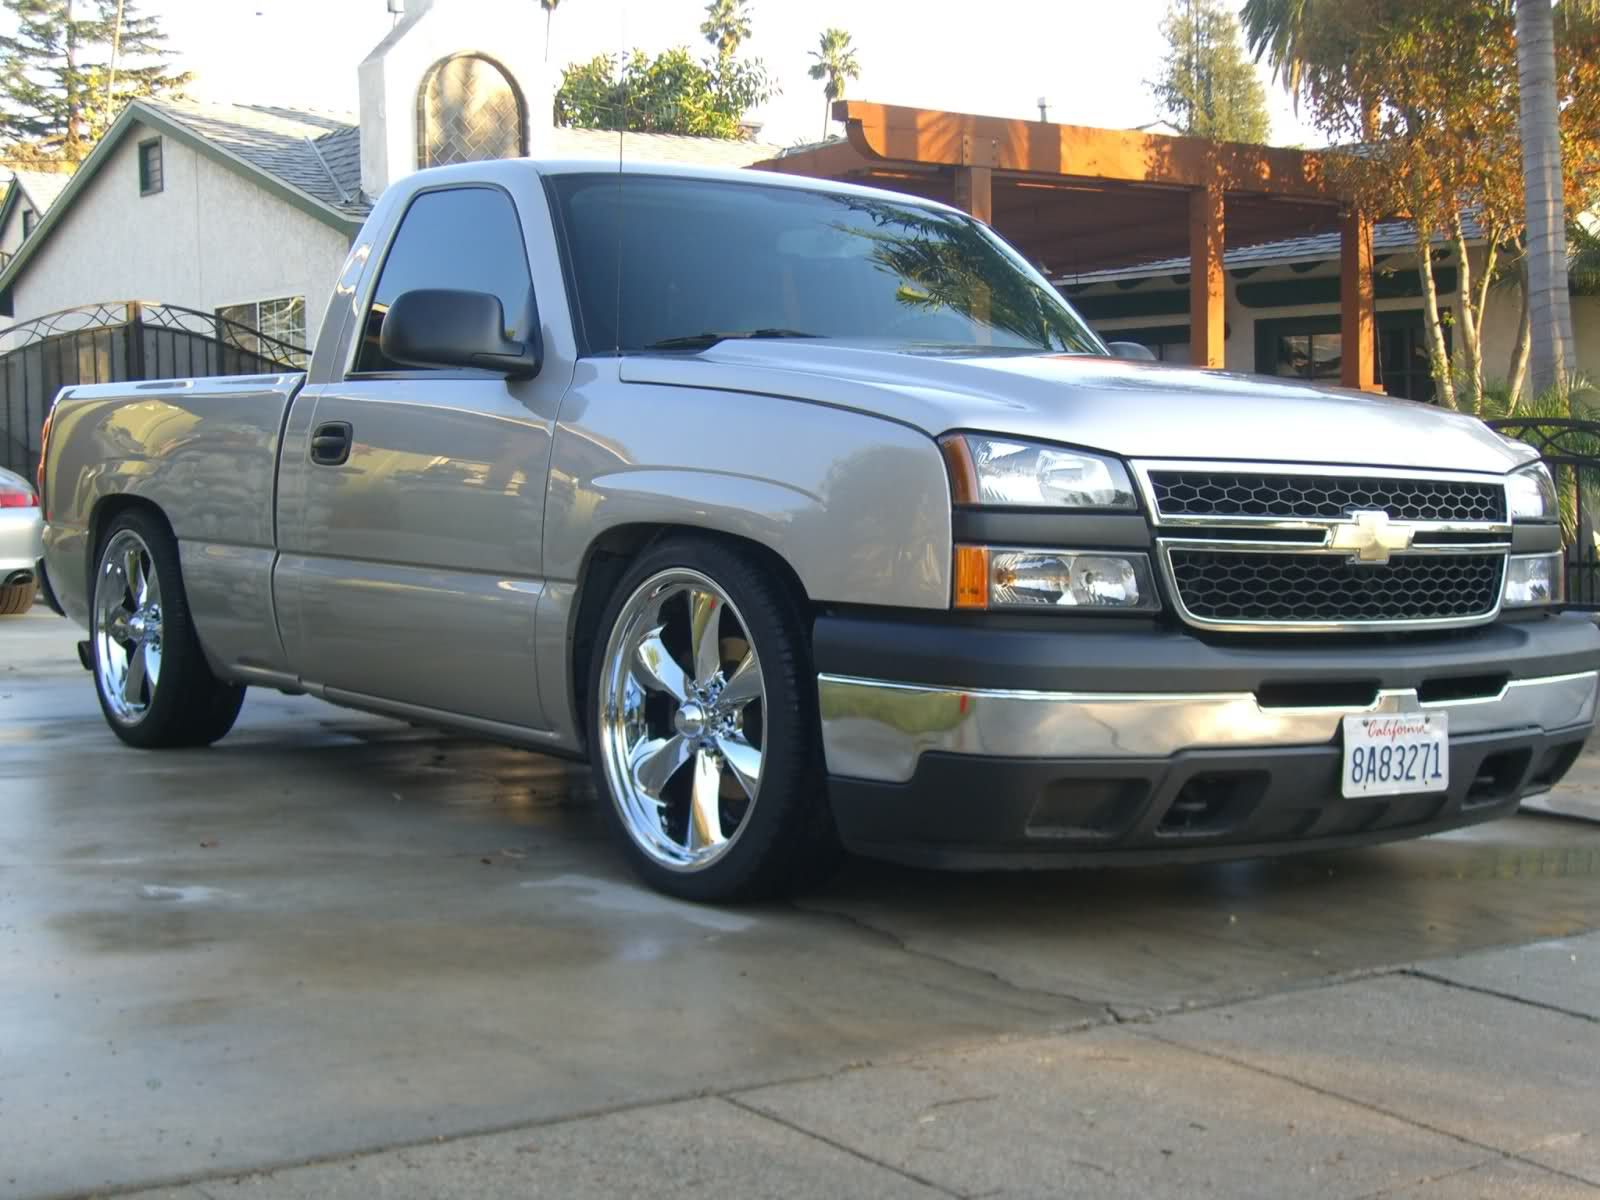 hight resolution of ca 2006 rcsb silverado lowered 4 6 chevy truck forum gmc truck forum gmfullsize com